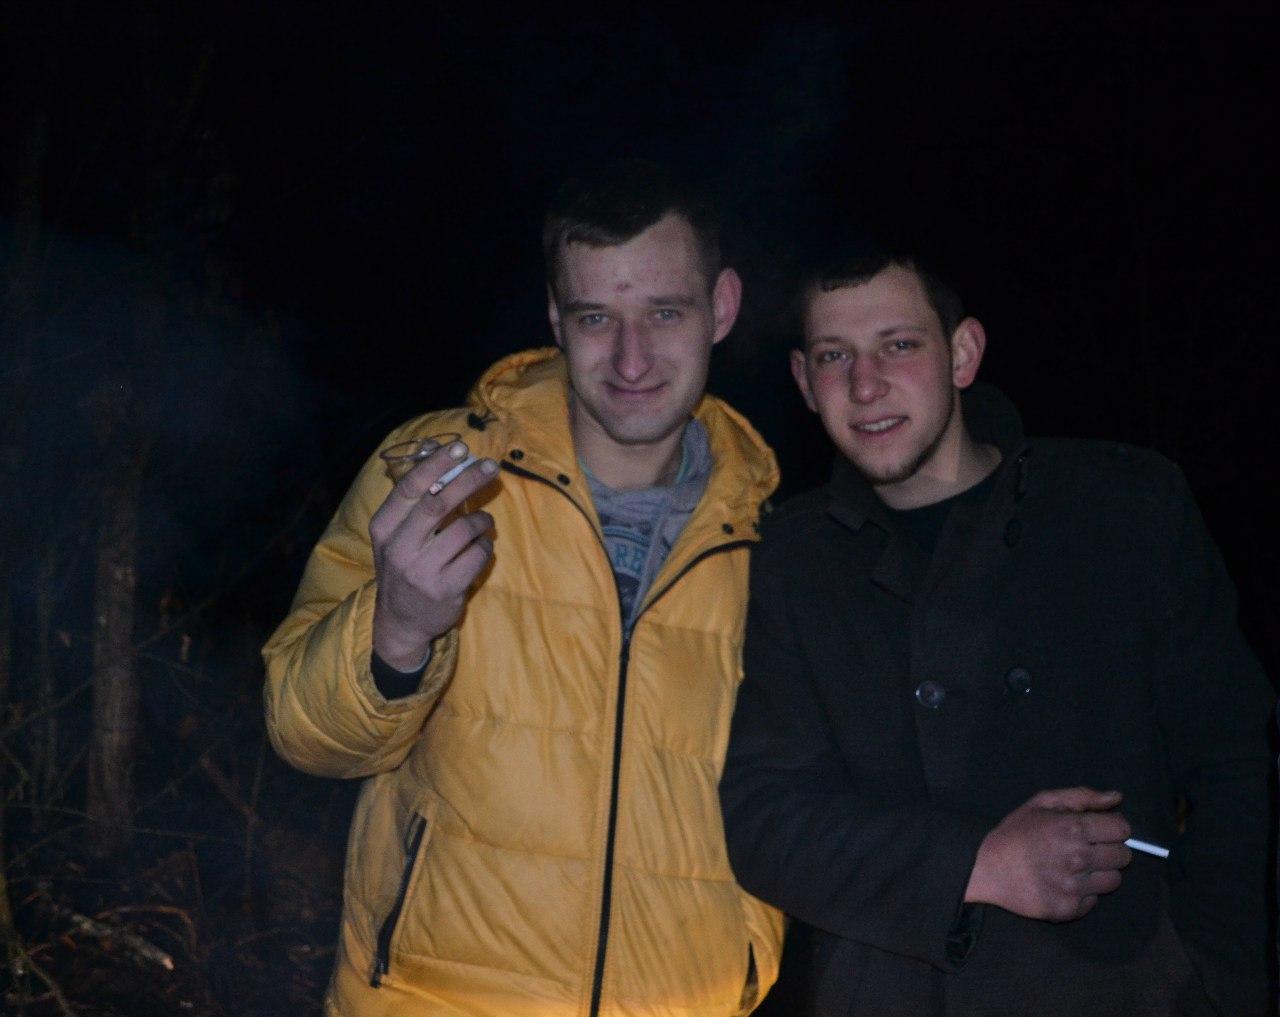 23-24.11.15 г. Ночь в лесу. Елена Руденко ( 57 фото) DhpYPn6fL1Q